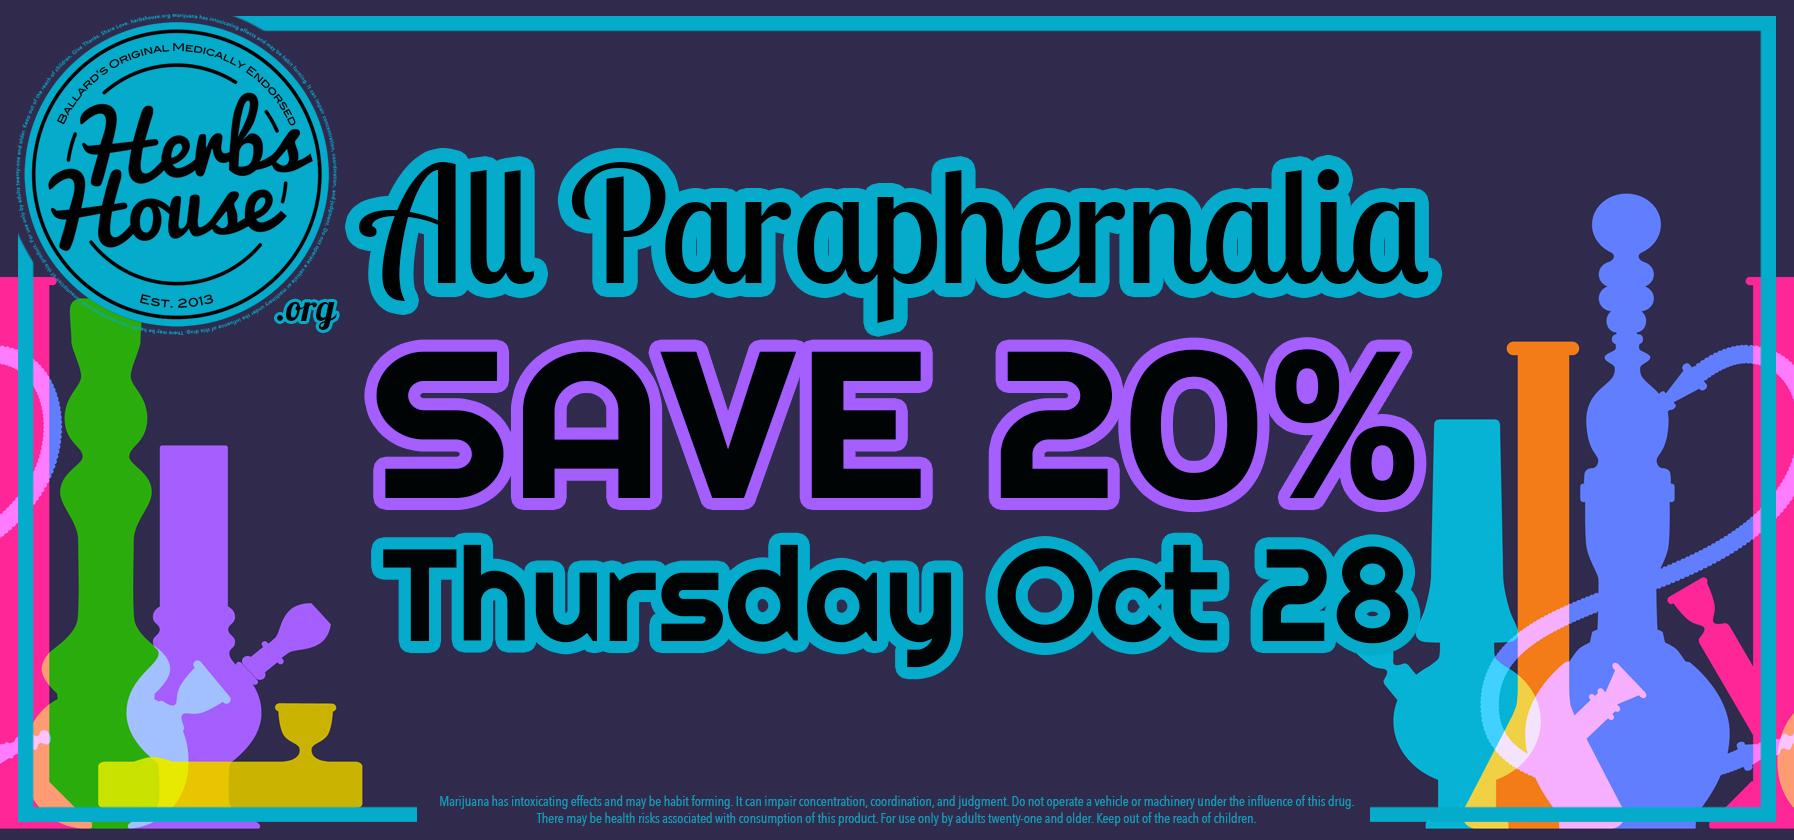 SAVE 20% All Paraphernalia Herbs House Oct 28